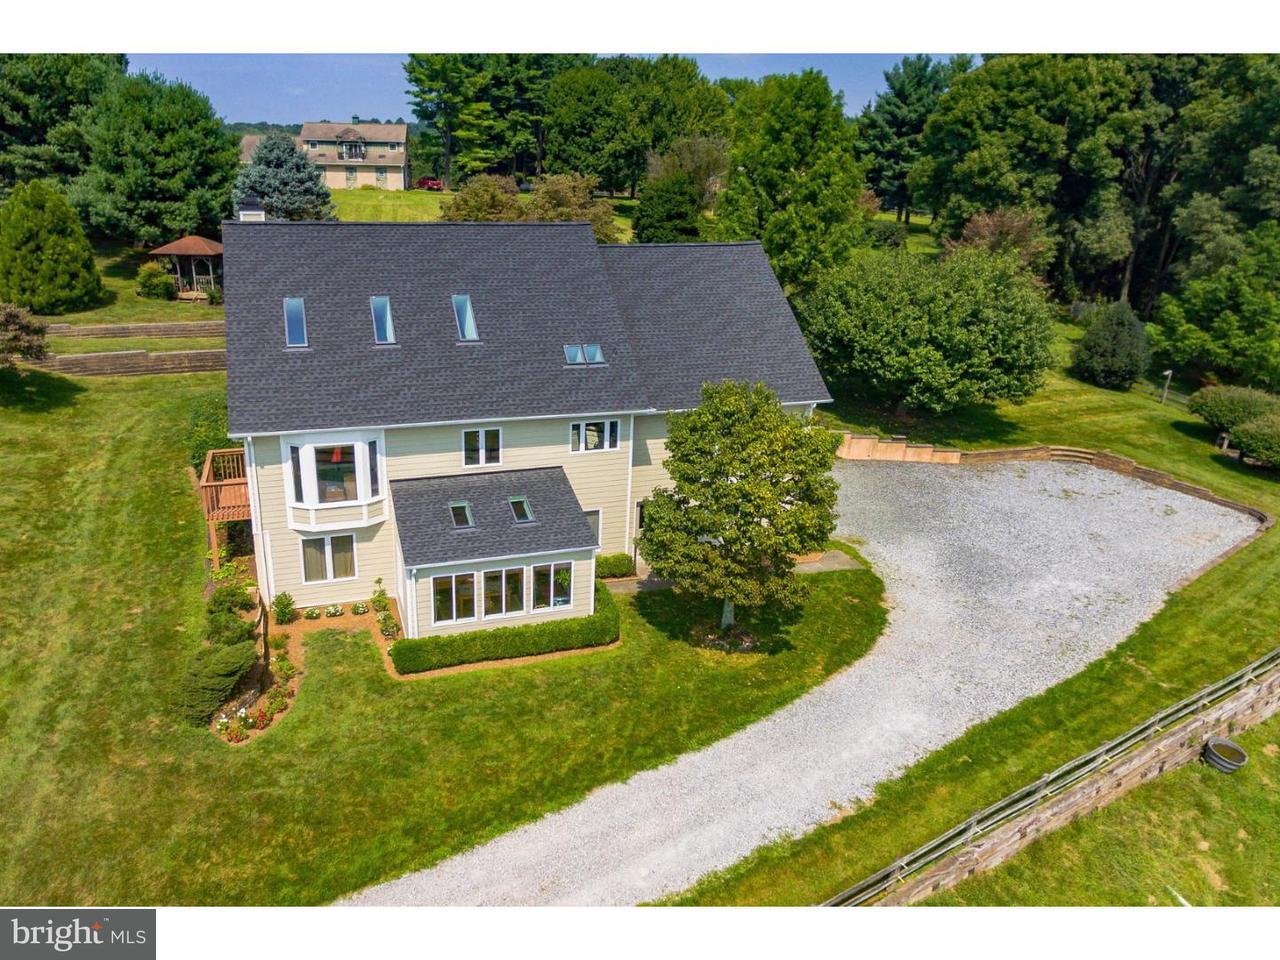 Single Family Home for Sale at 8 SPRINGLEA Lane Chester Springs, Pennsylvania 19425 United States